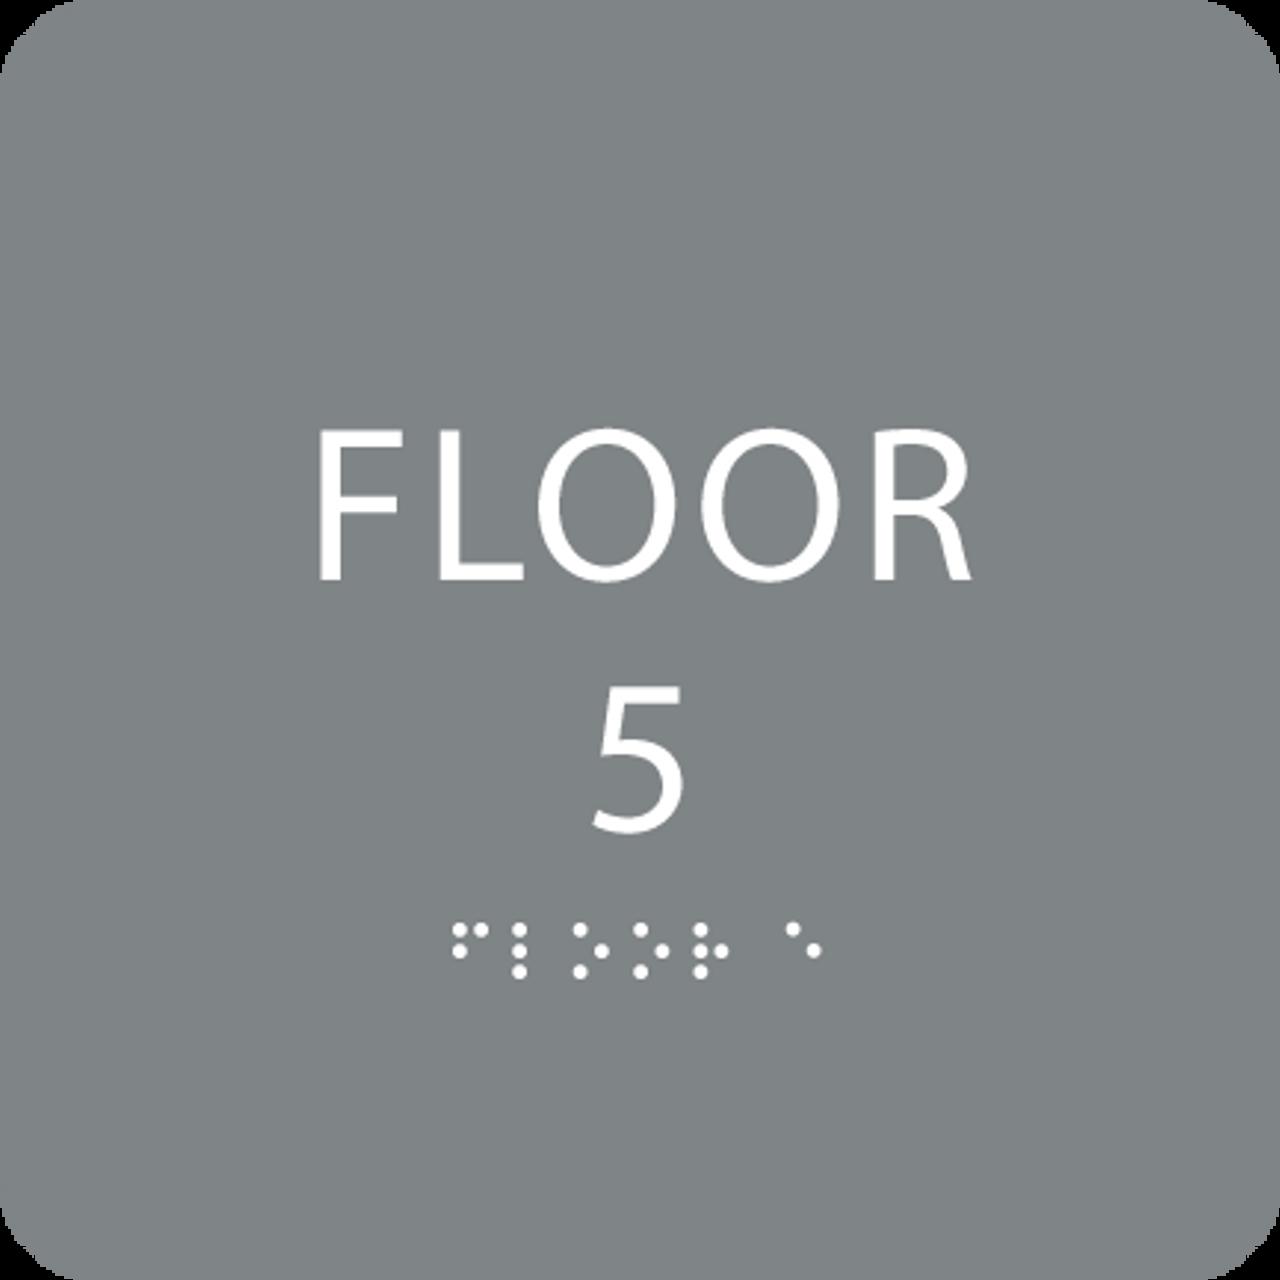 Grey Floor 5 Level Number Sign